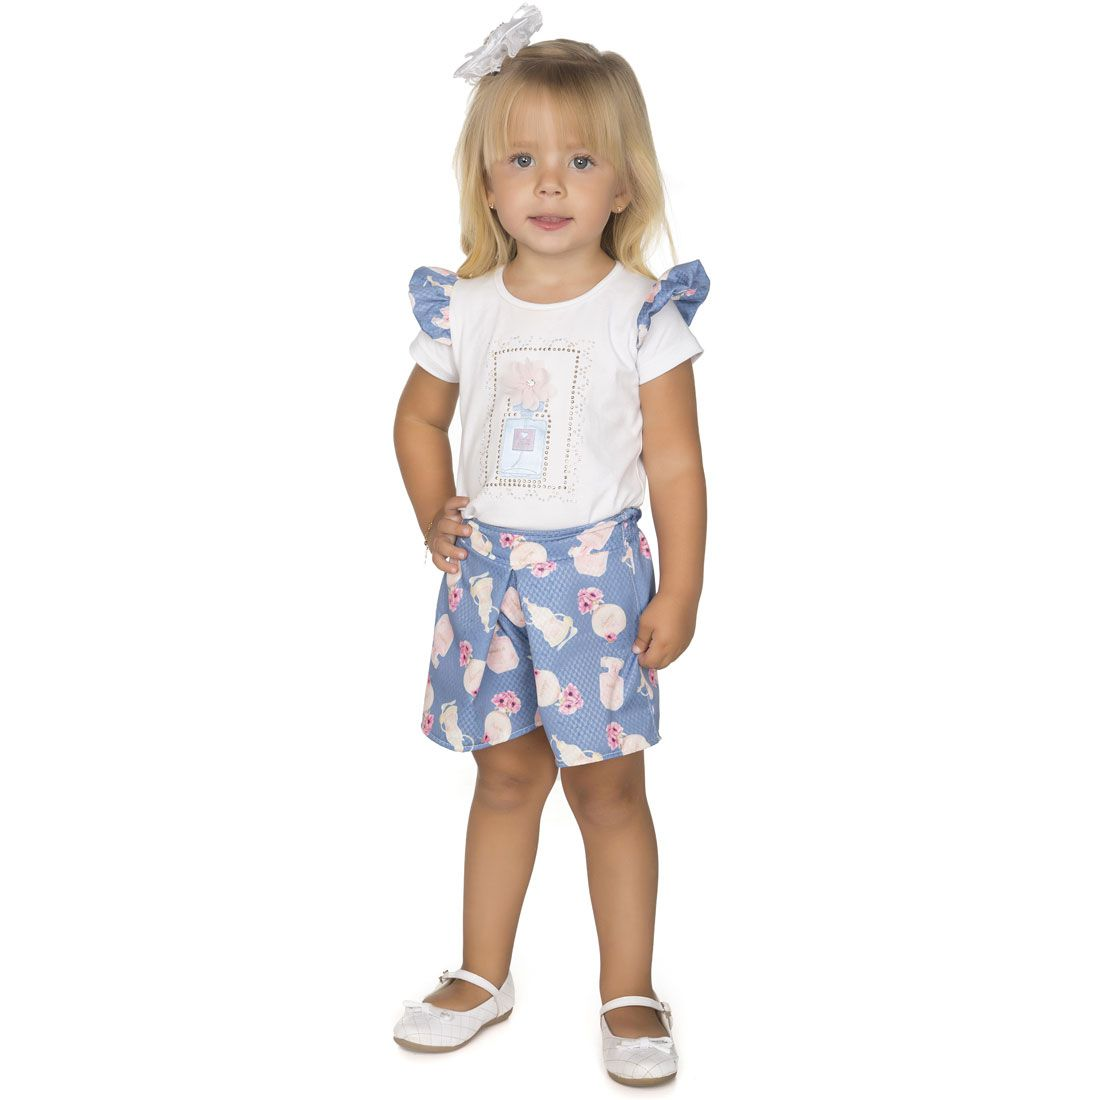 441dbd6b26 conjunto carinhoso menina blusa short bege 12 lst1